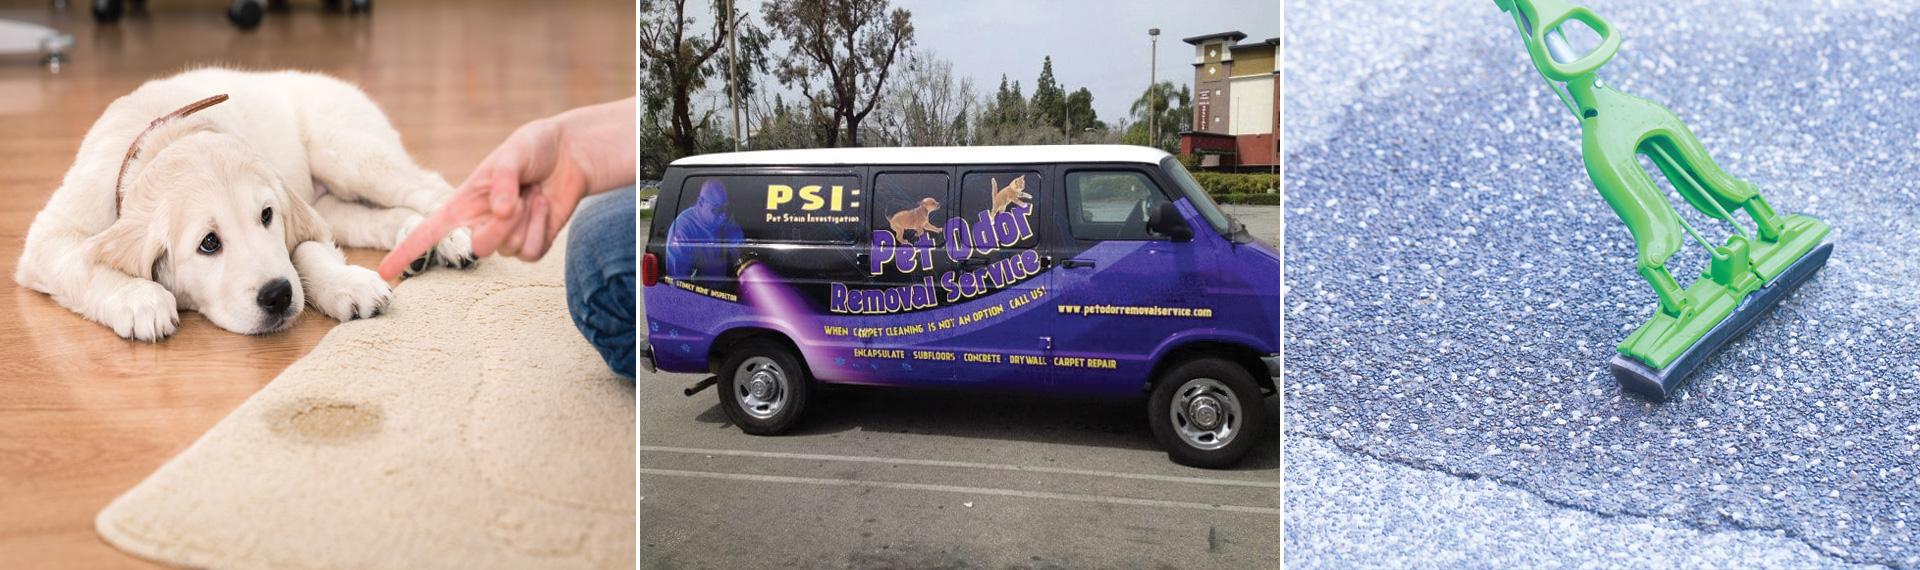 Pet Odor Removal Service Rancho Santa Margarita CA